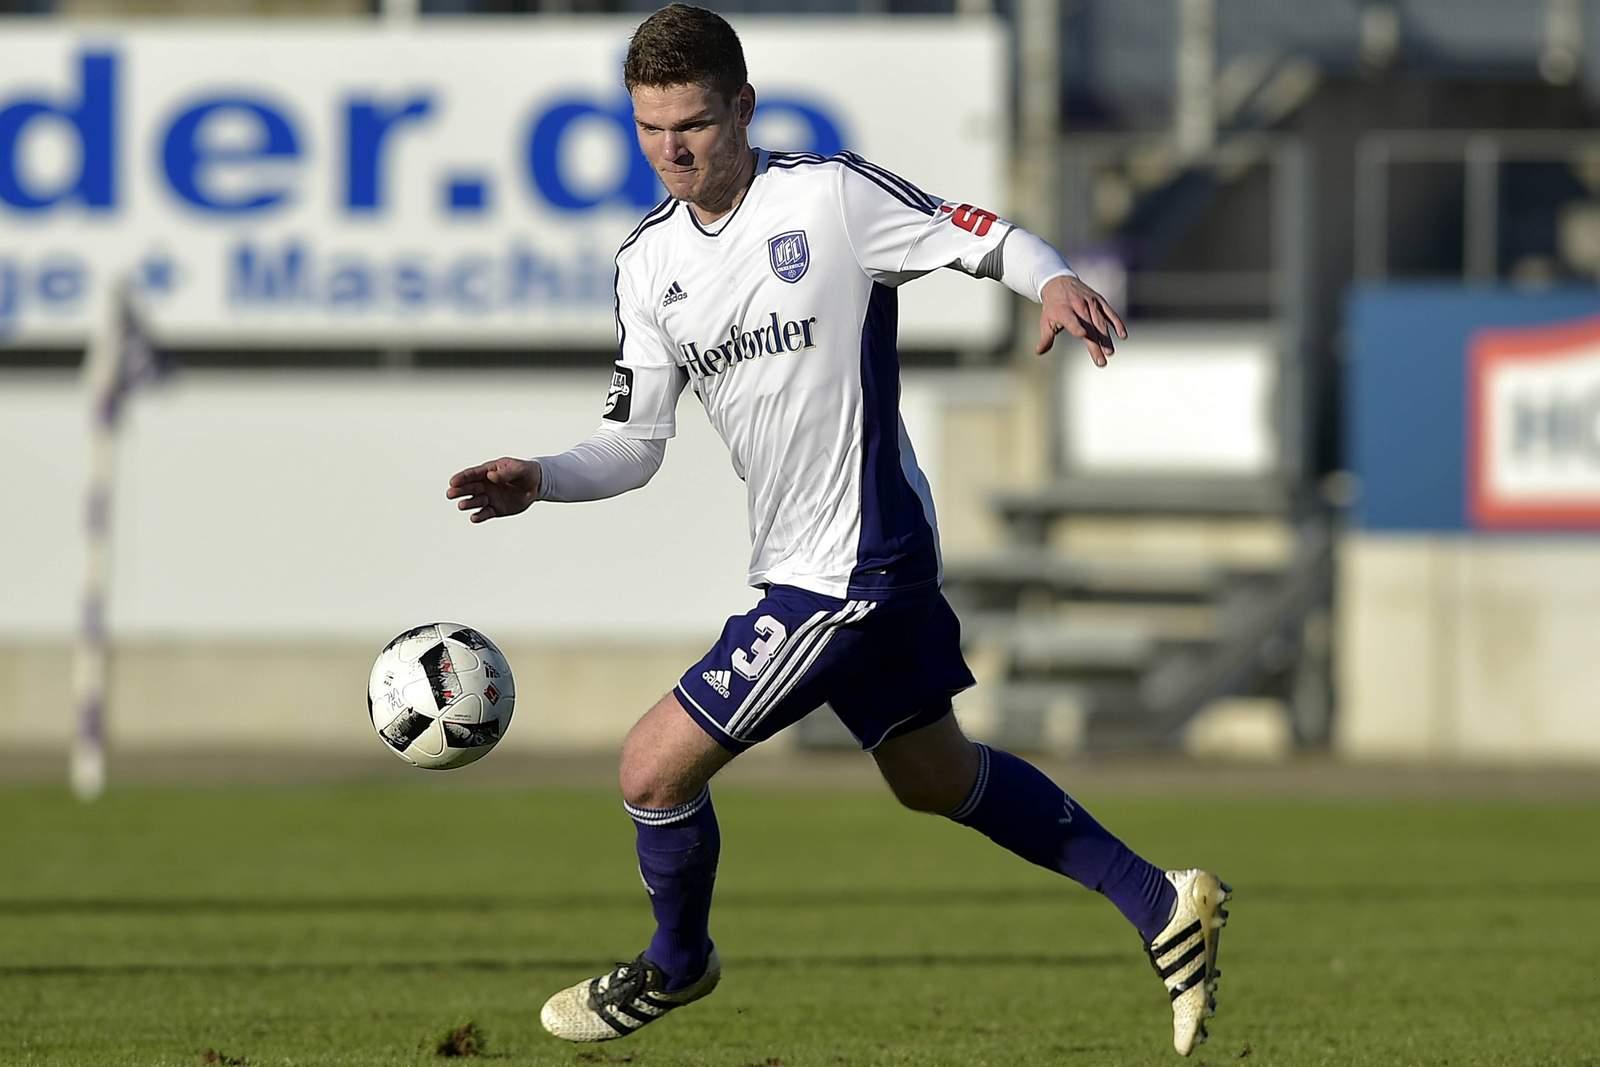 Anthony Syhre vom VfL Osnabrück